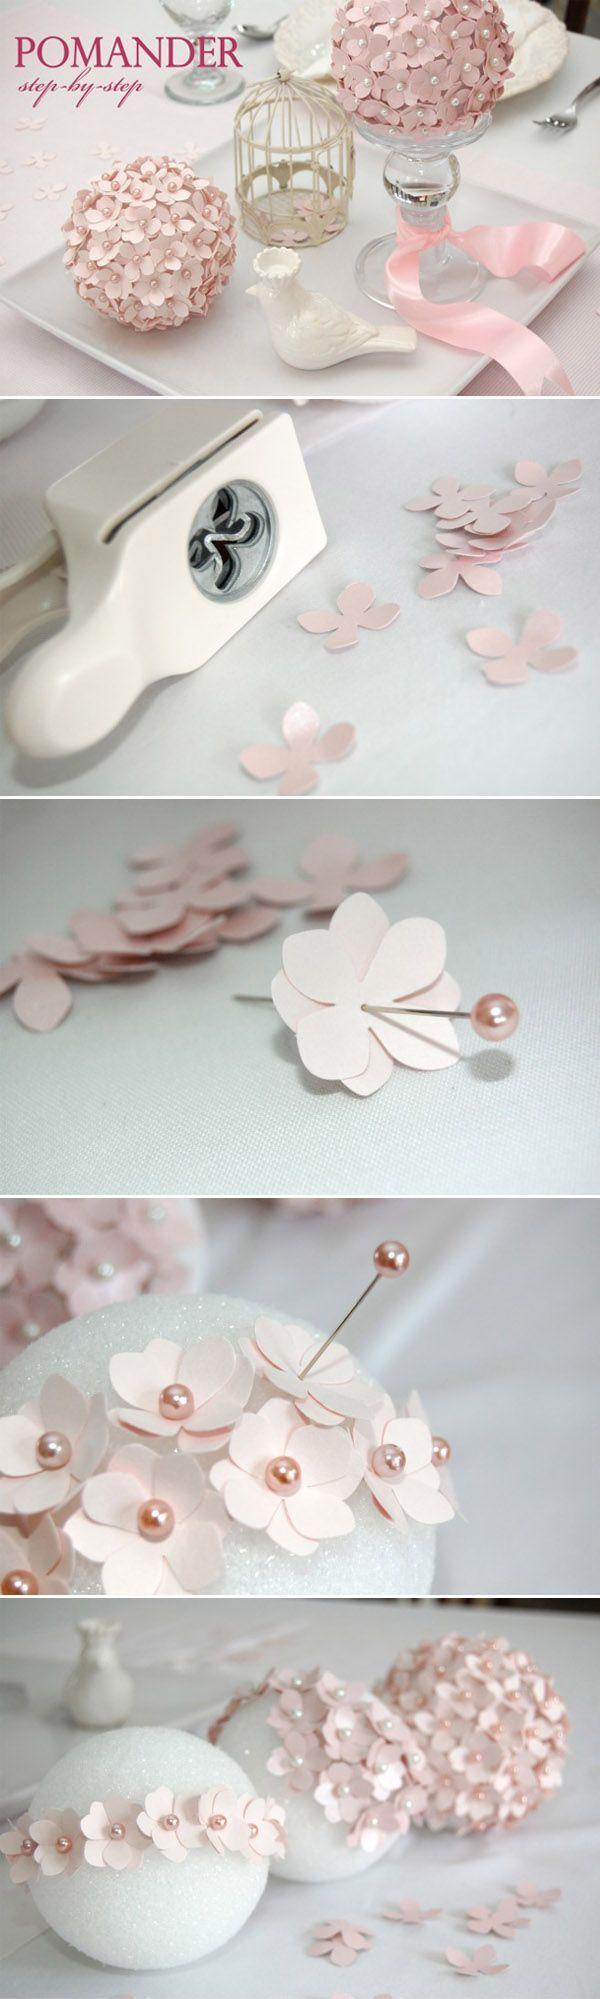 10 Creative DIY Wedding Centerpieces with Tutorials #paperflowercenterpieces